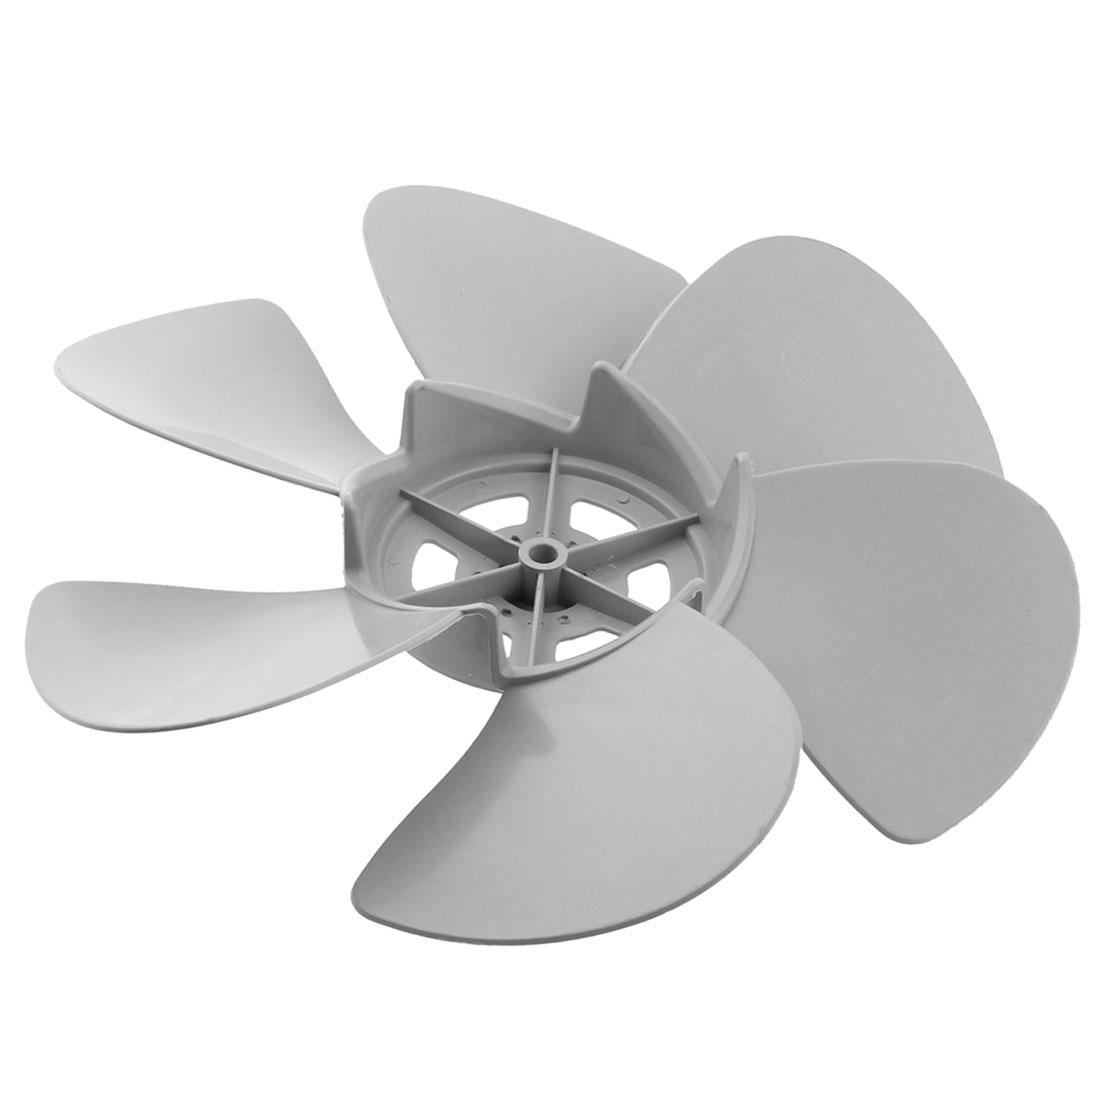 290mm Diameter 8mm Shaft Hole Plastic Home Kitchen Ventilator Fan Vane Gray